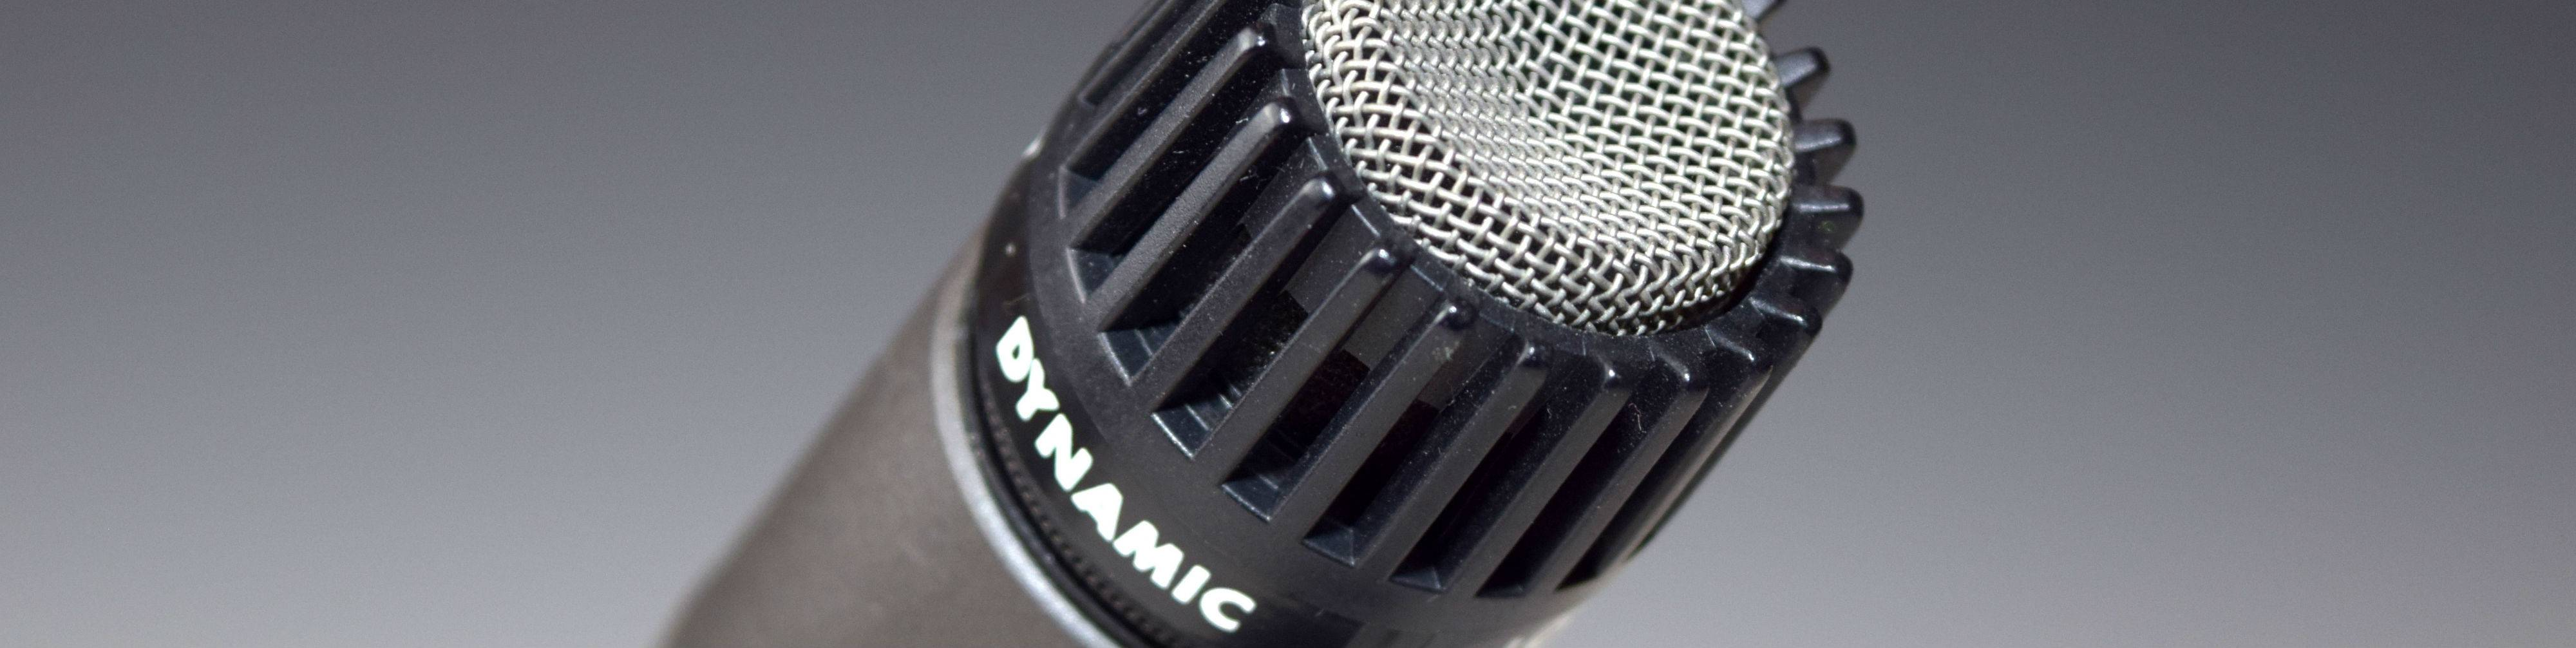 A Shure SM57 dynamic microphone